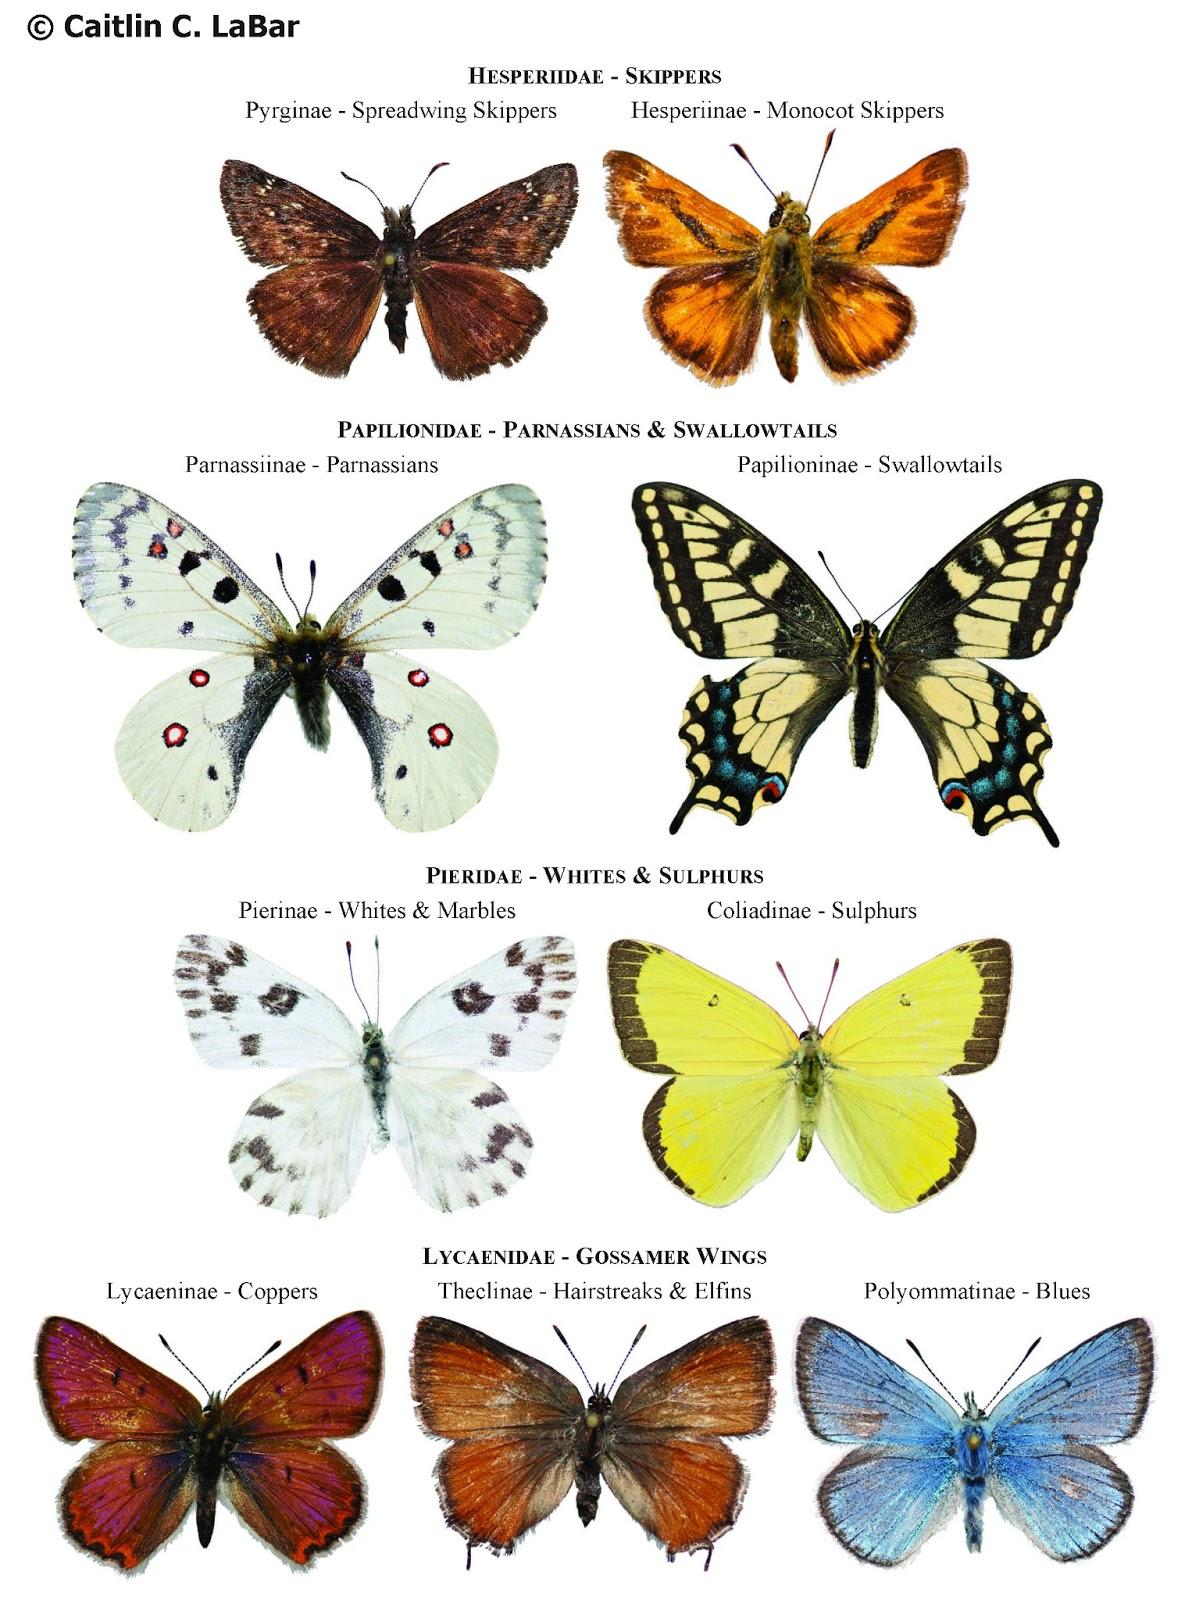 butterfly species butterfly species butterfly species butterfly typesButterfly Species Names